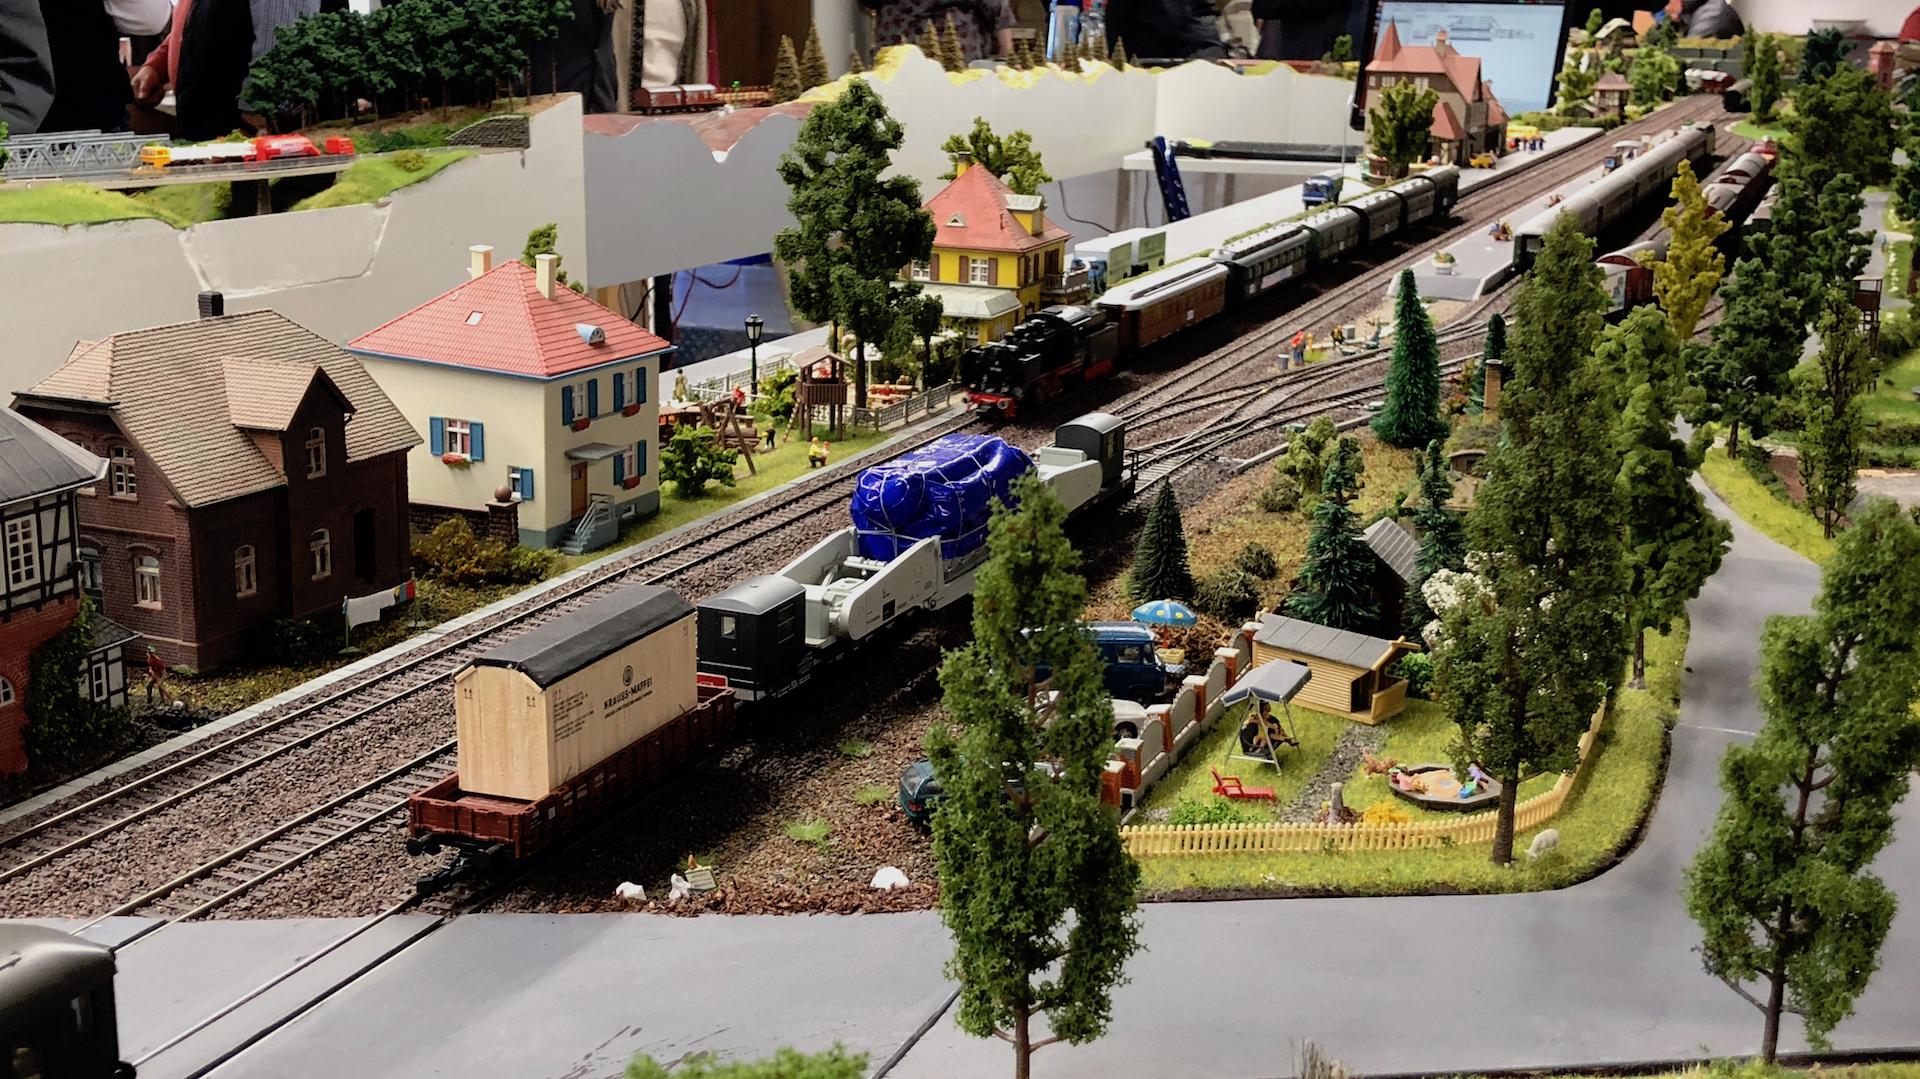 18_02_24_Schautag-Eisenbahnfreunde-Hameln_003